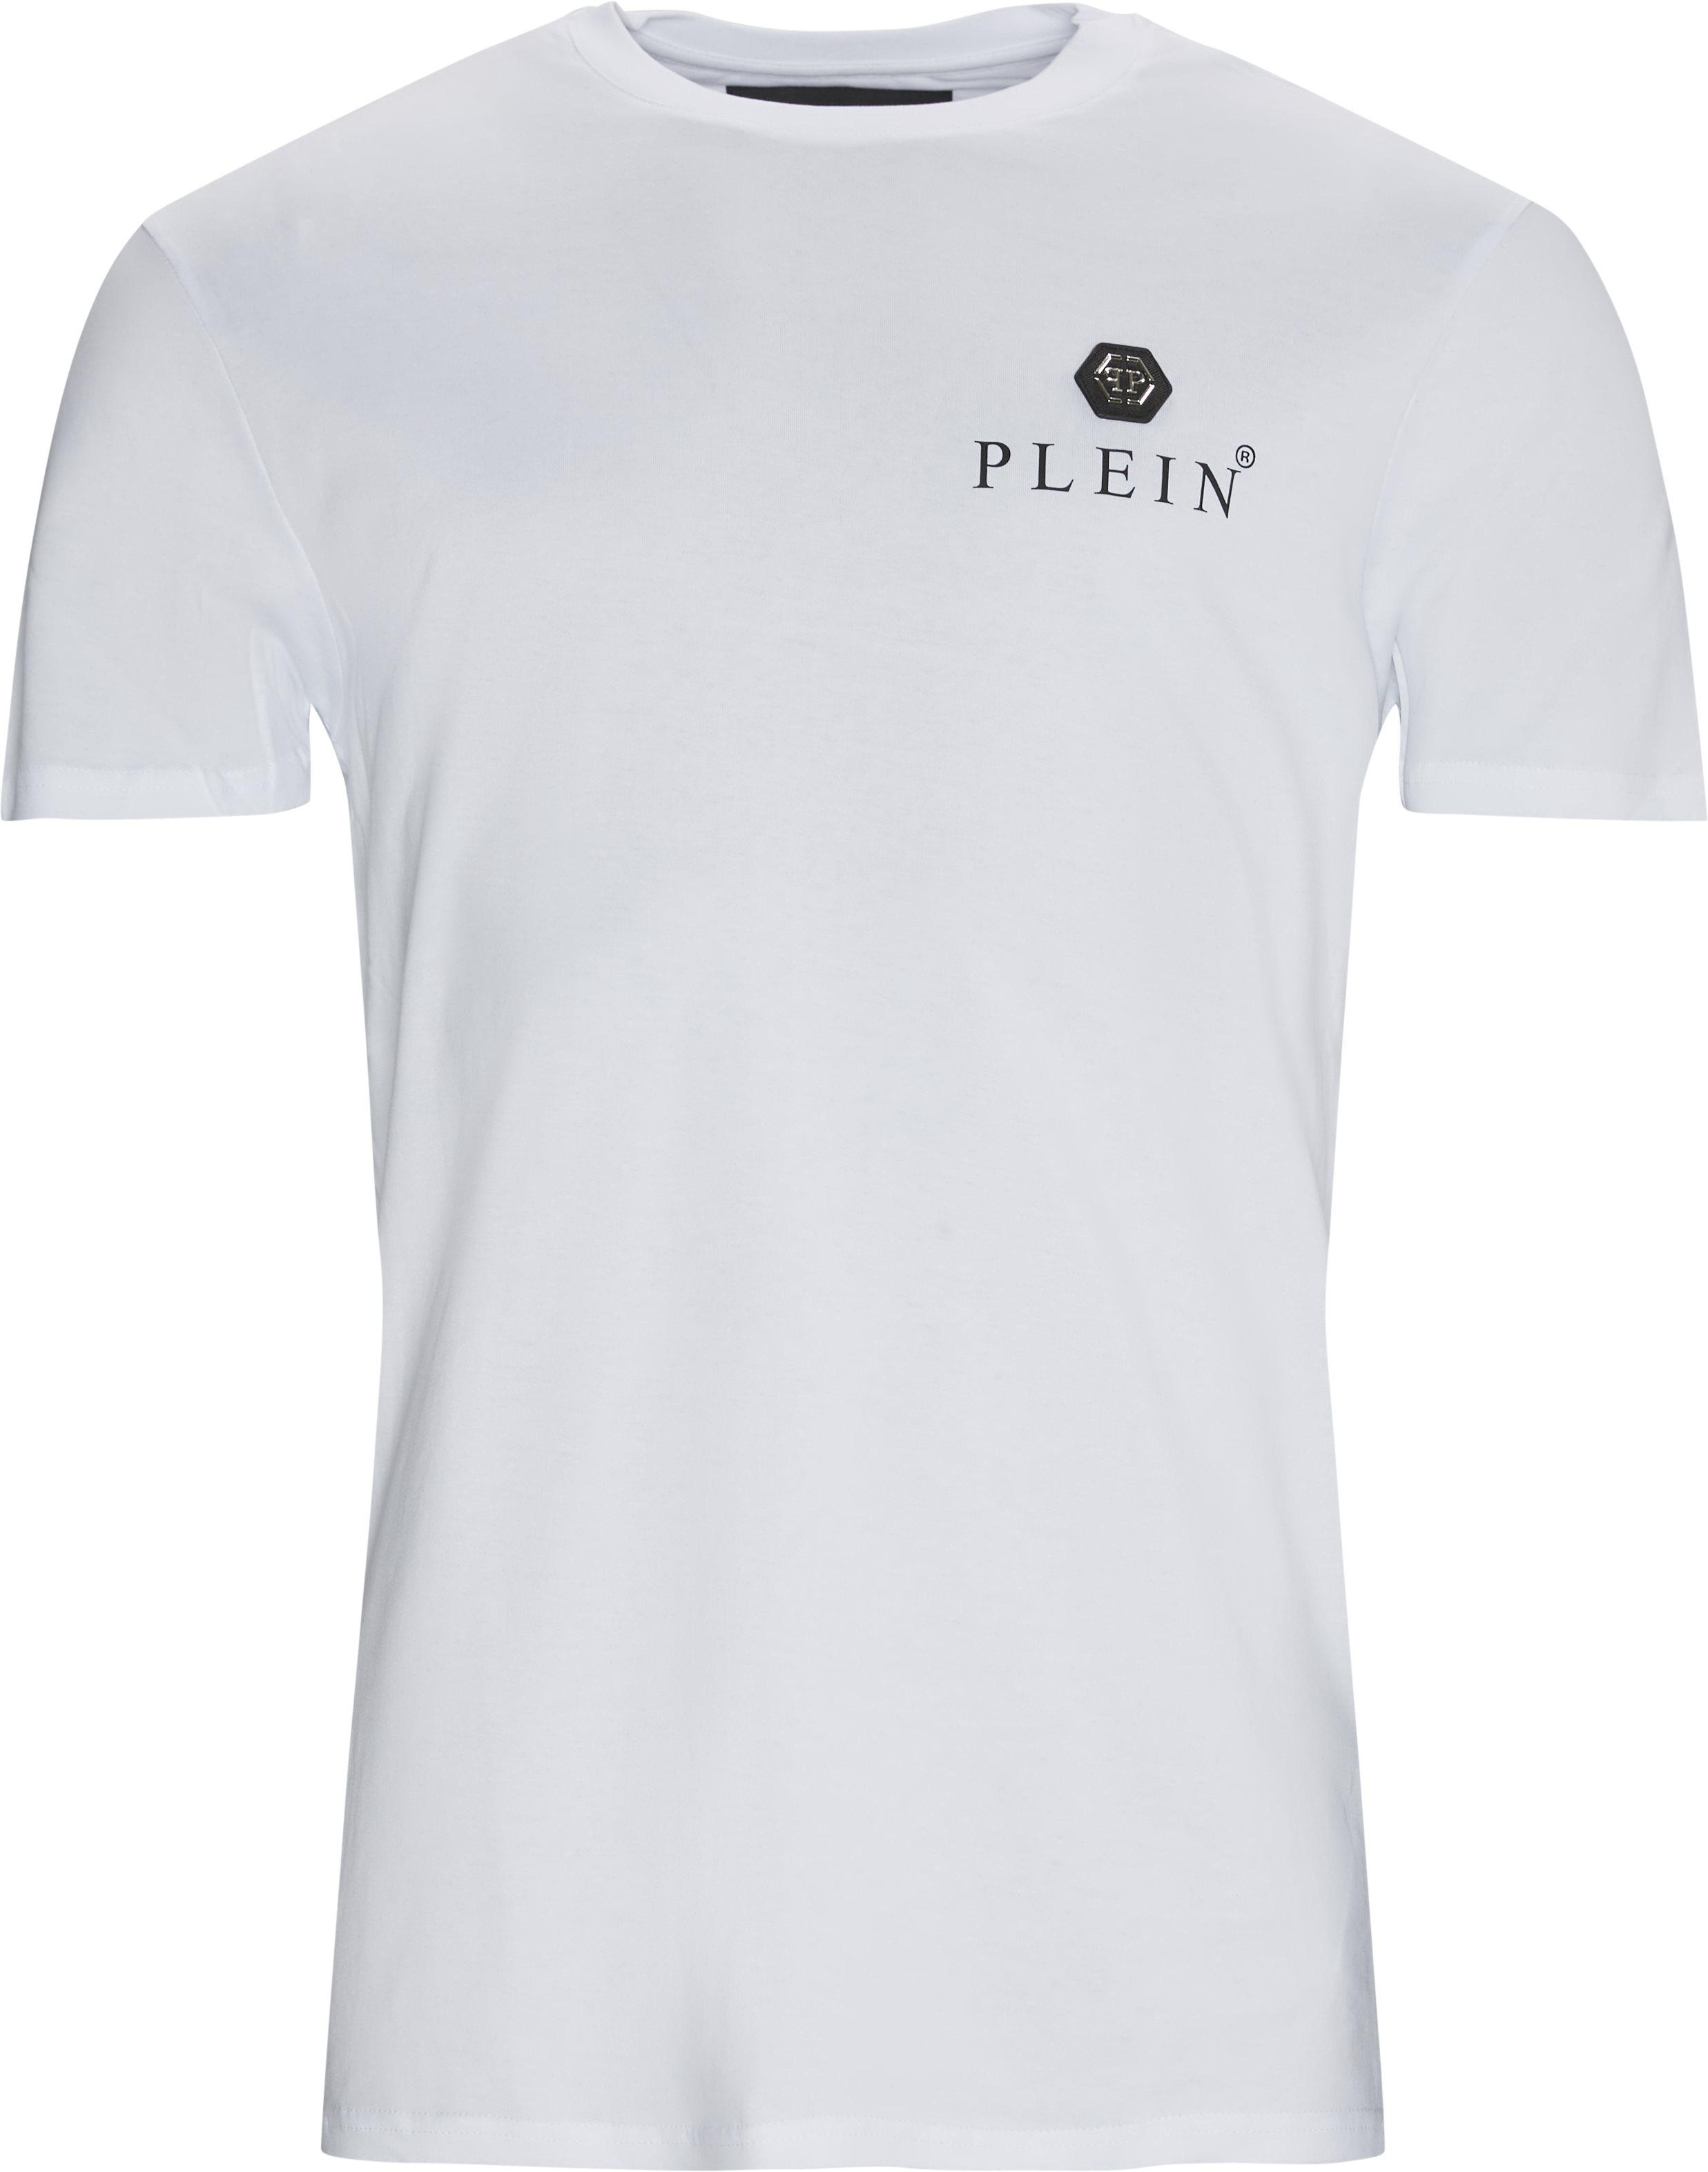 Iconic Plein Tee - T-shirts - Loose fit - Hvid